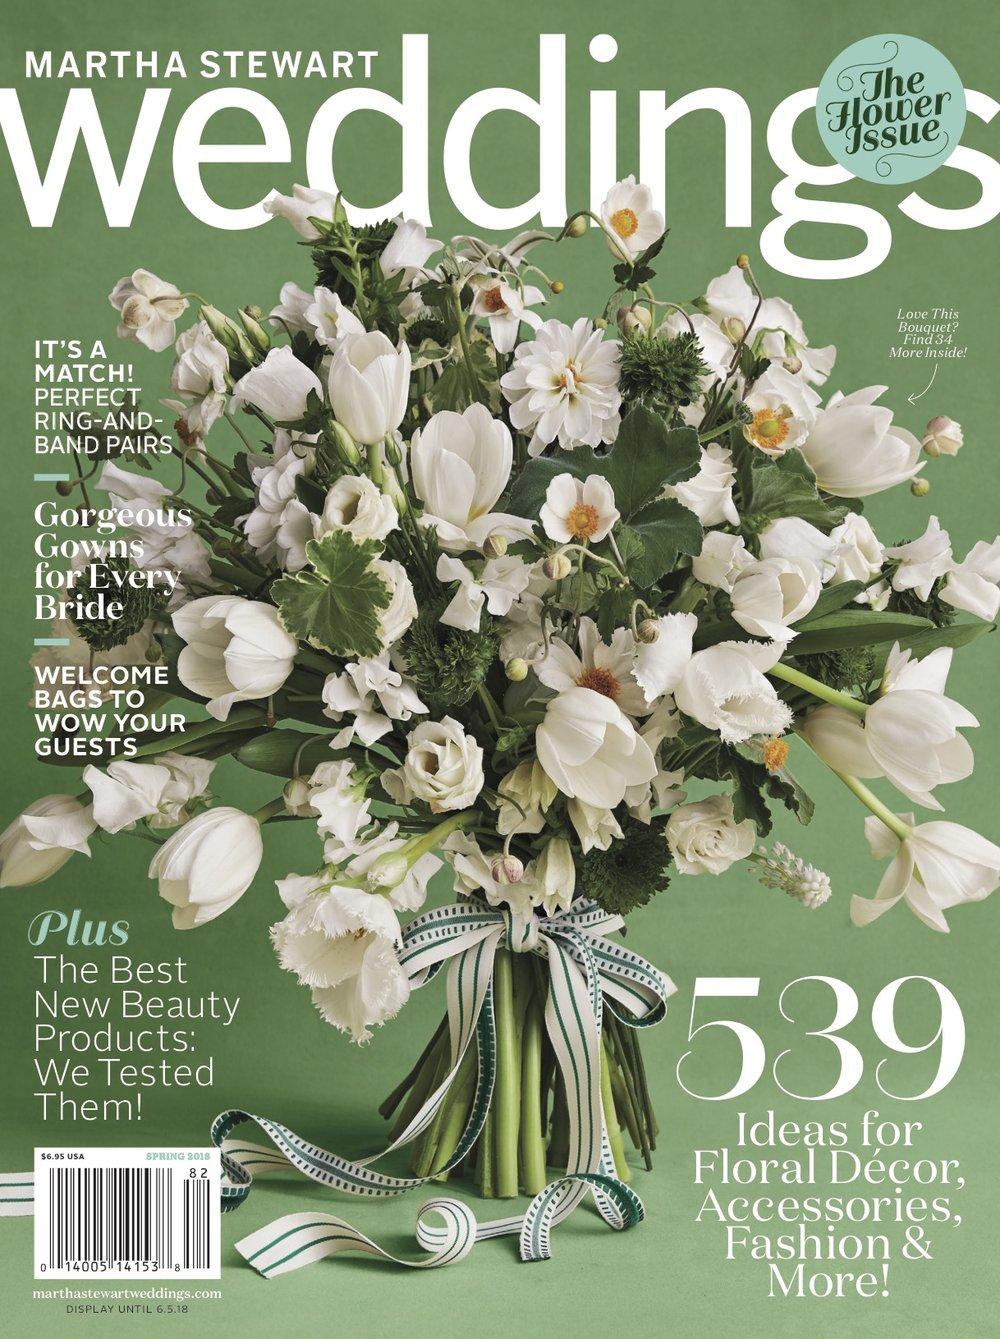 Martha Stewart Weddings Feature.jpg